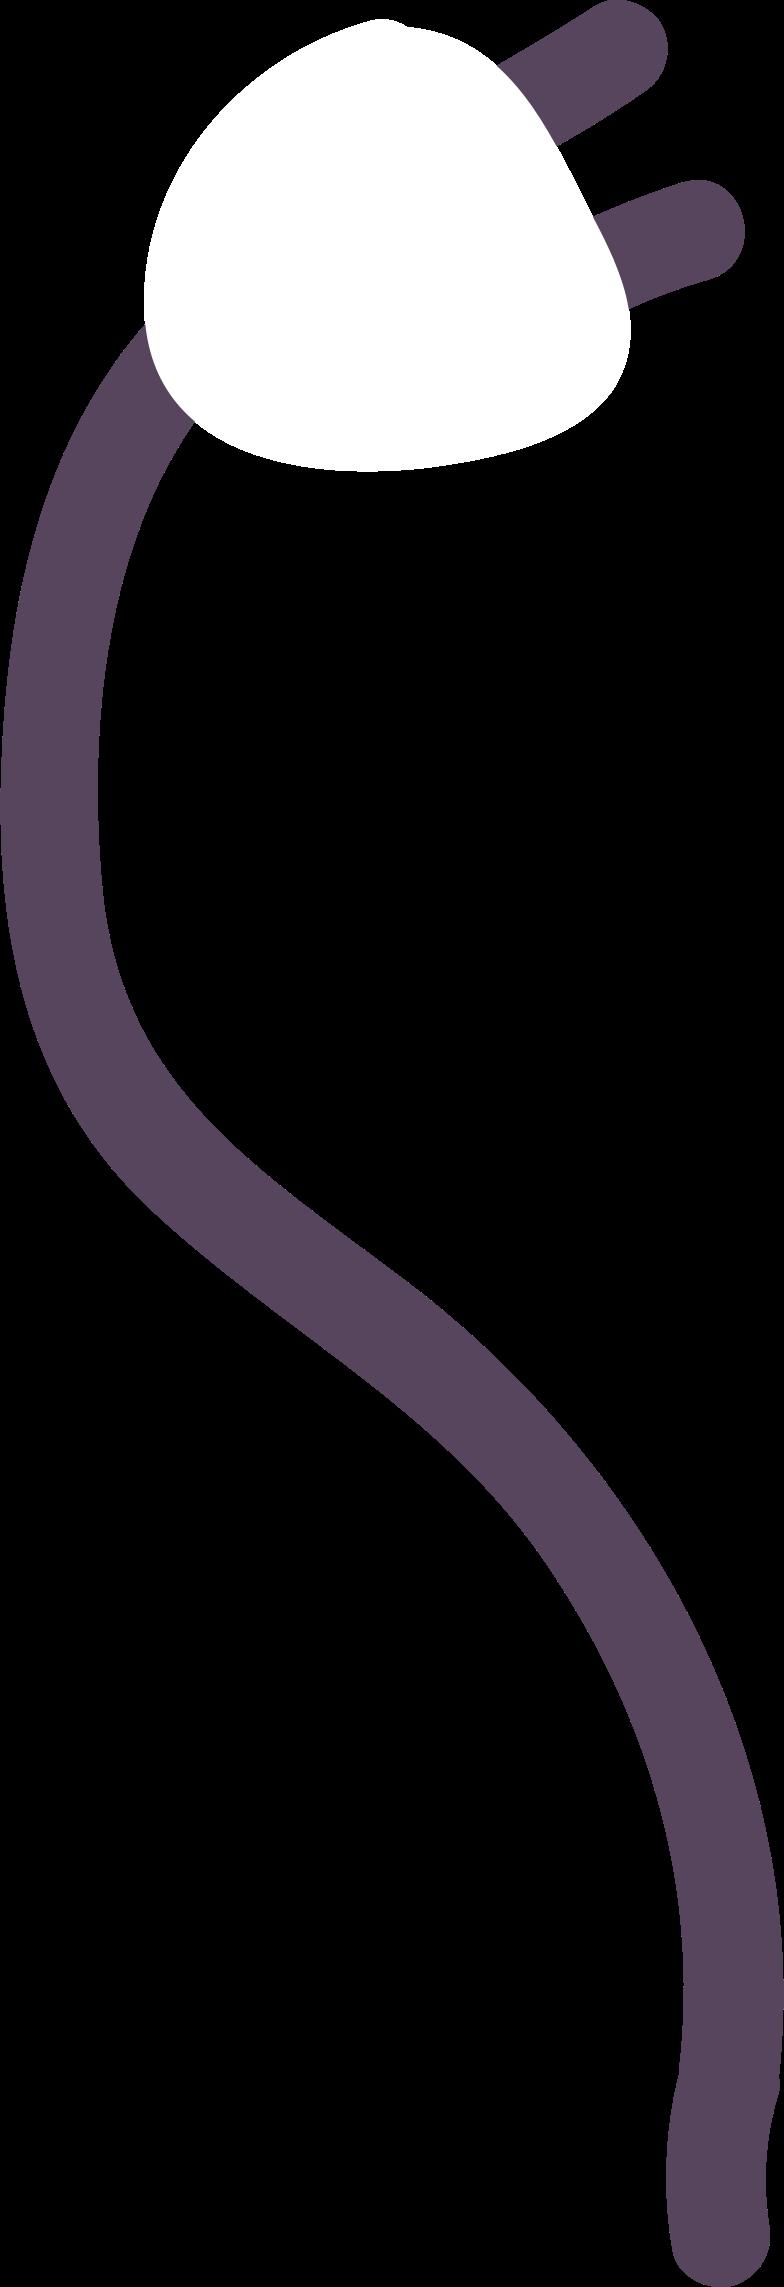 socket cable Clipart illustration in PNG, SVG